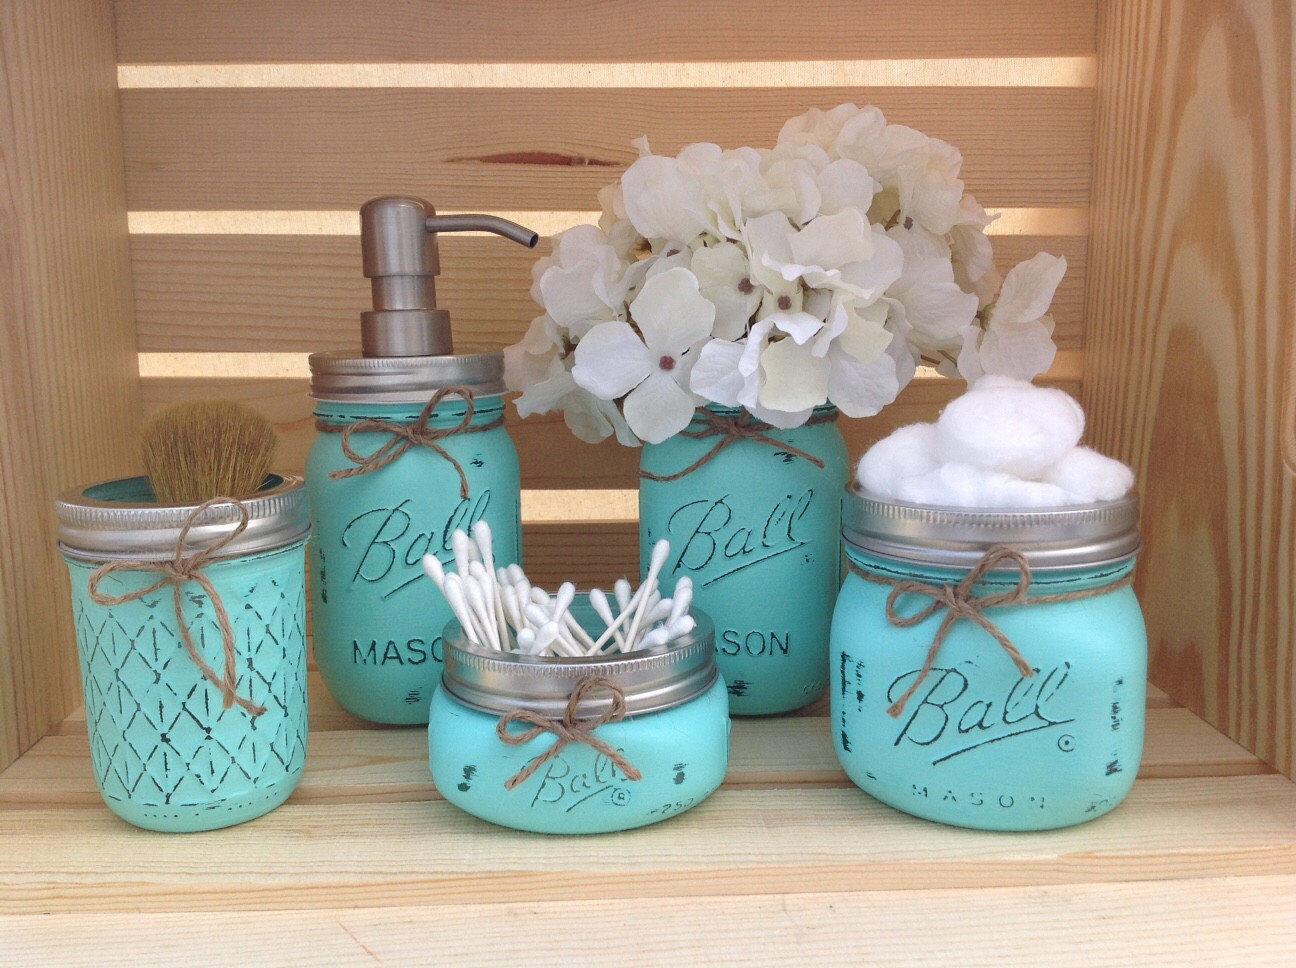 new mason jar bathroom accessories décor-Fantastic Mason Jar Bathroom Accessories Inspiration